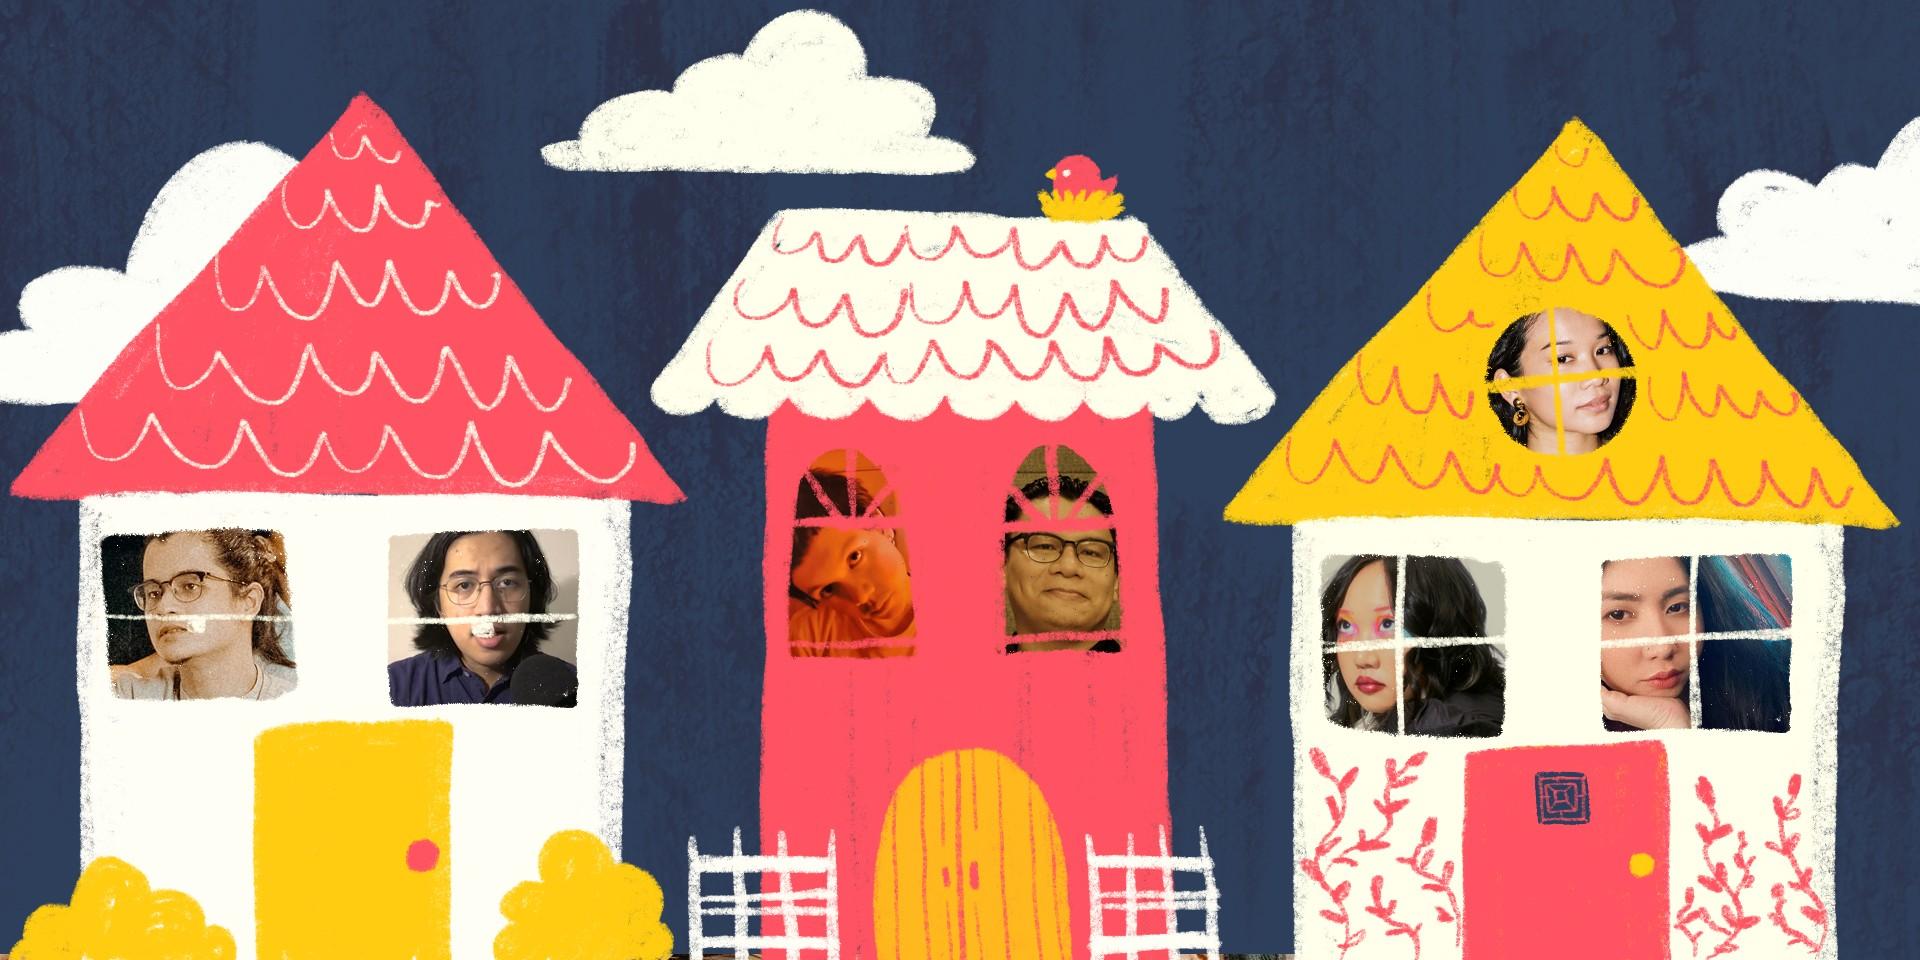 Quarantine jams you should follow: Zild, Ben&Ben, Oh, Flamingo!, ena mori, Bea Lorenzo, and more